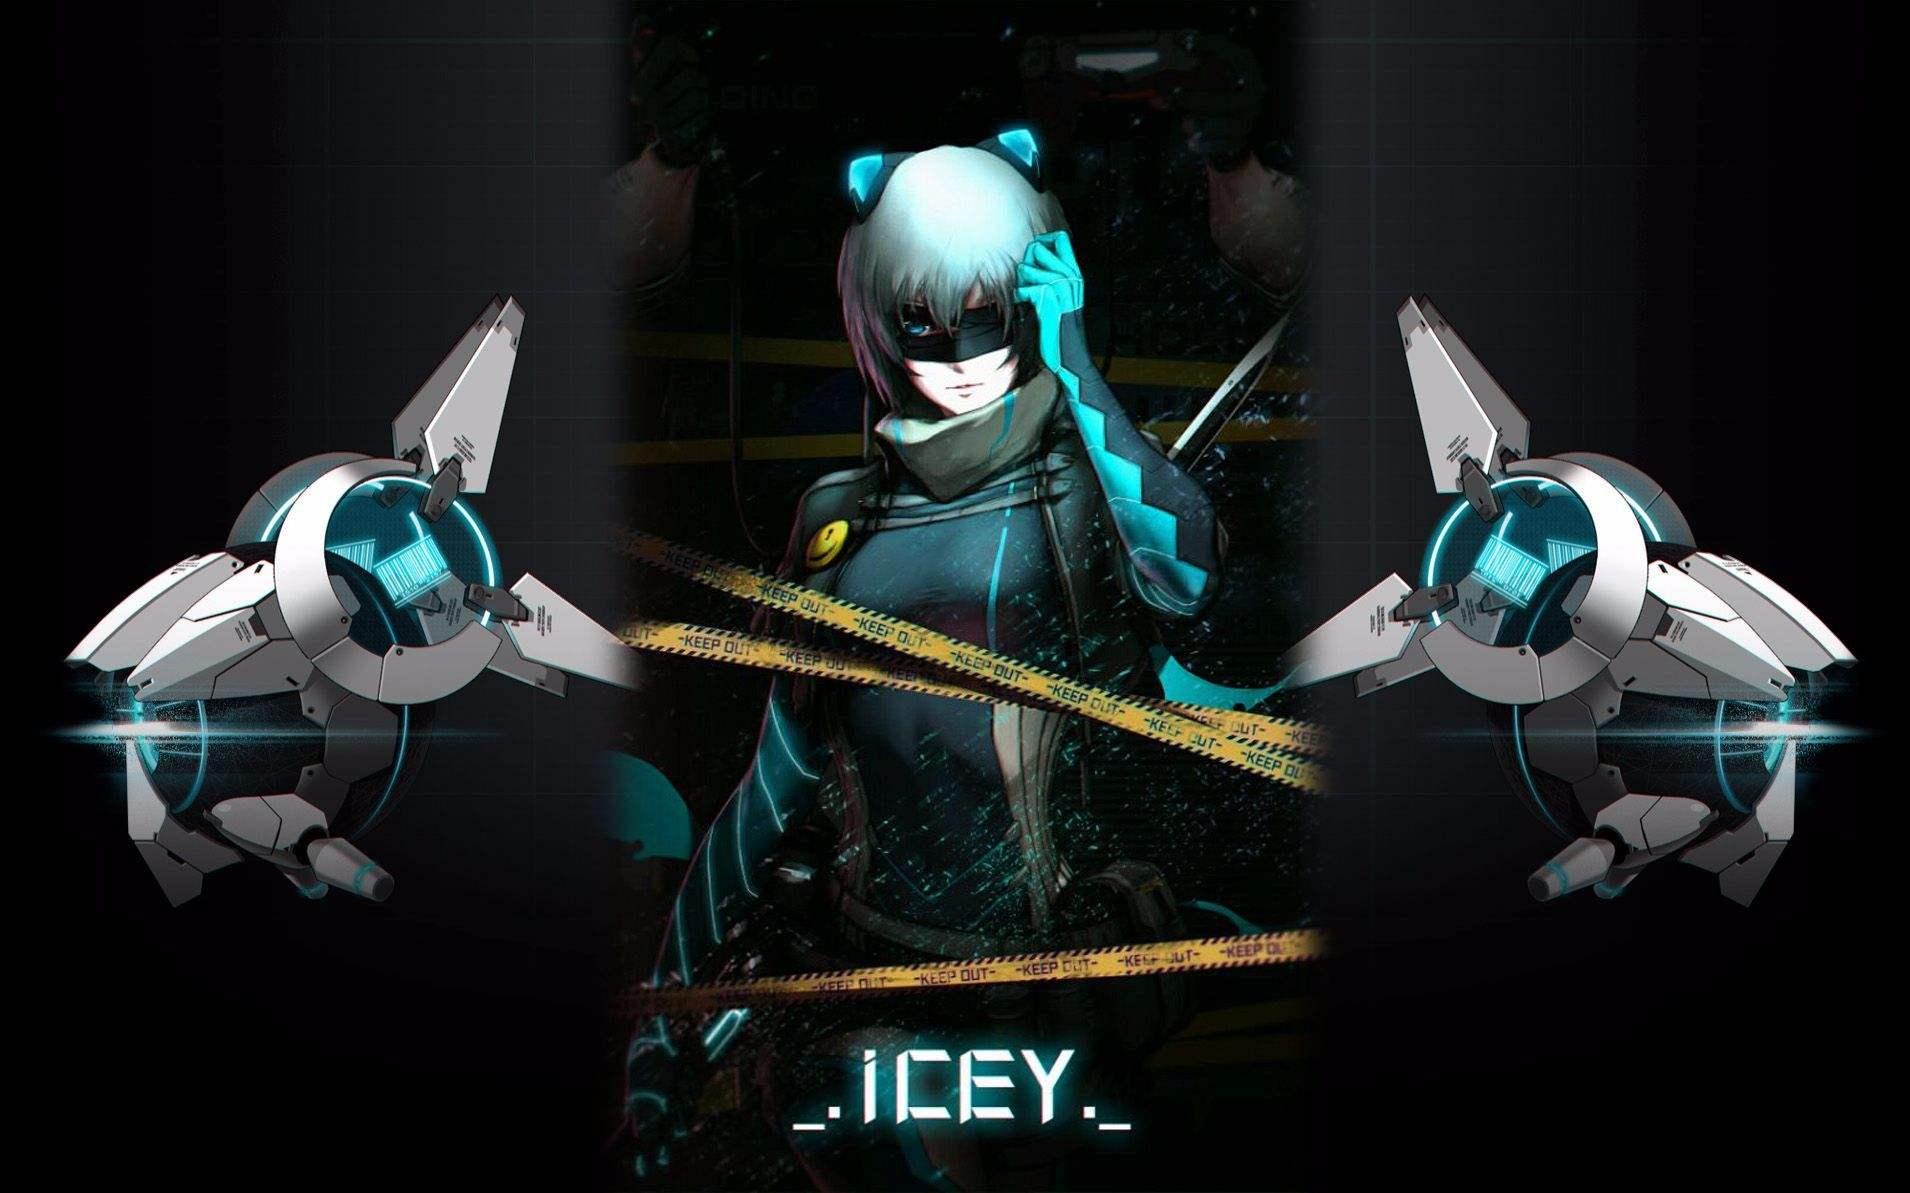 《icey》试玩视频-17173新游秒懂